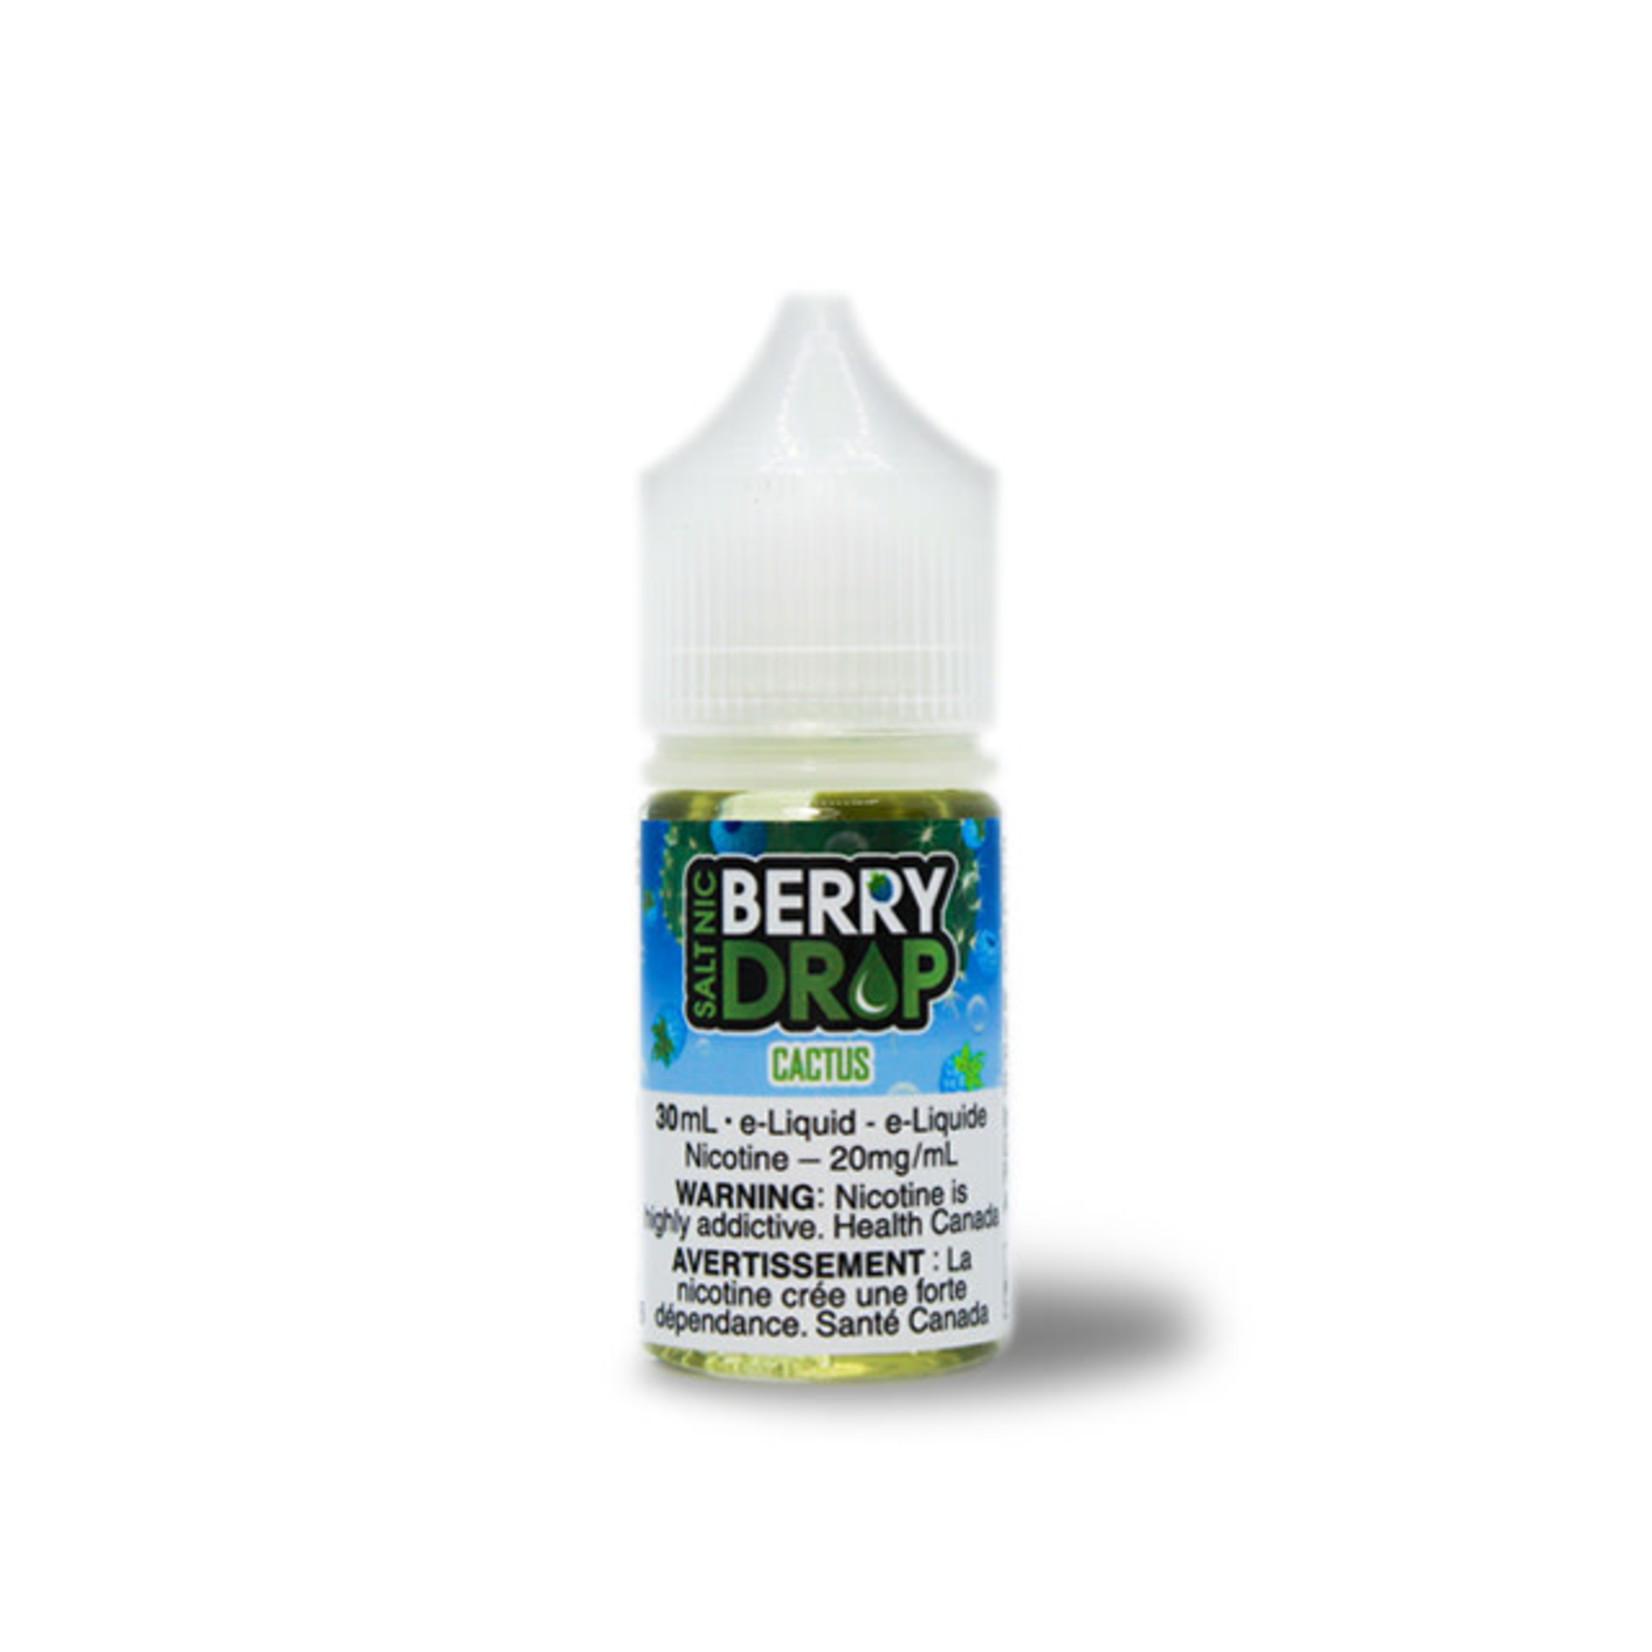 Berry Drops Salts Cactus